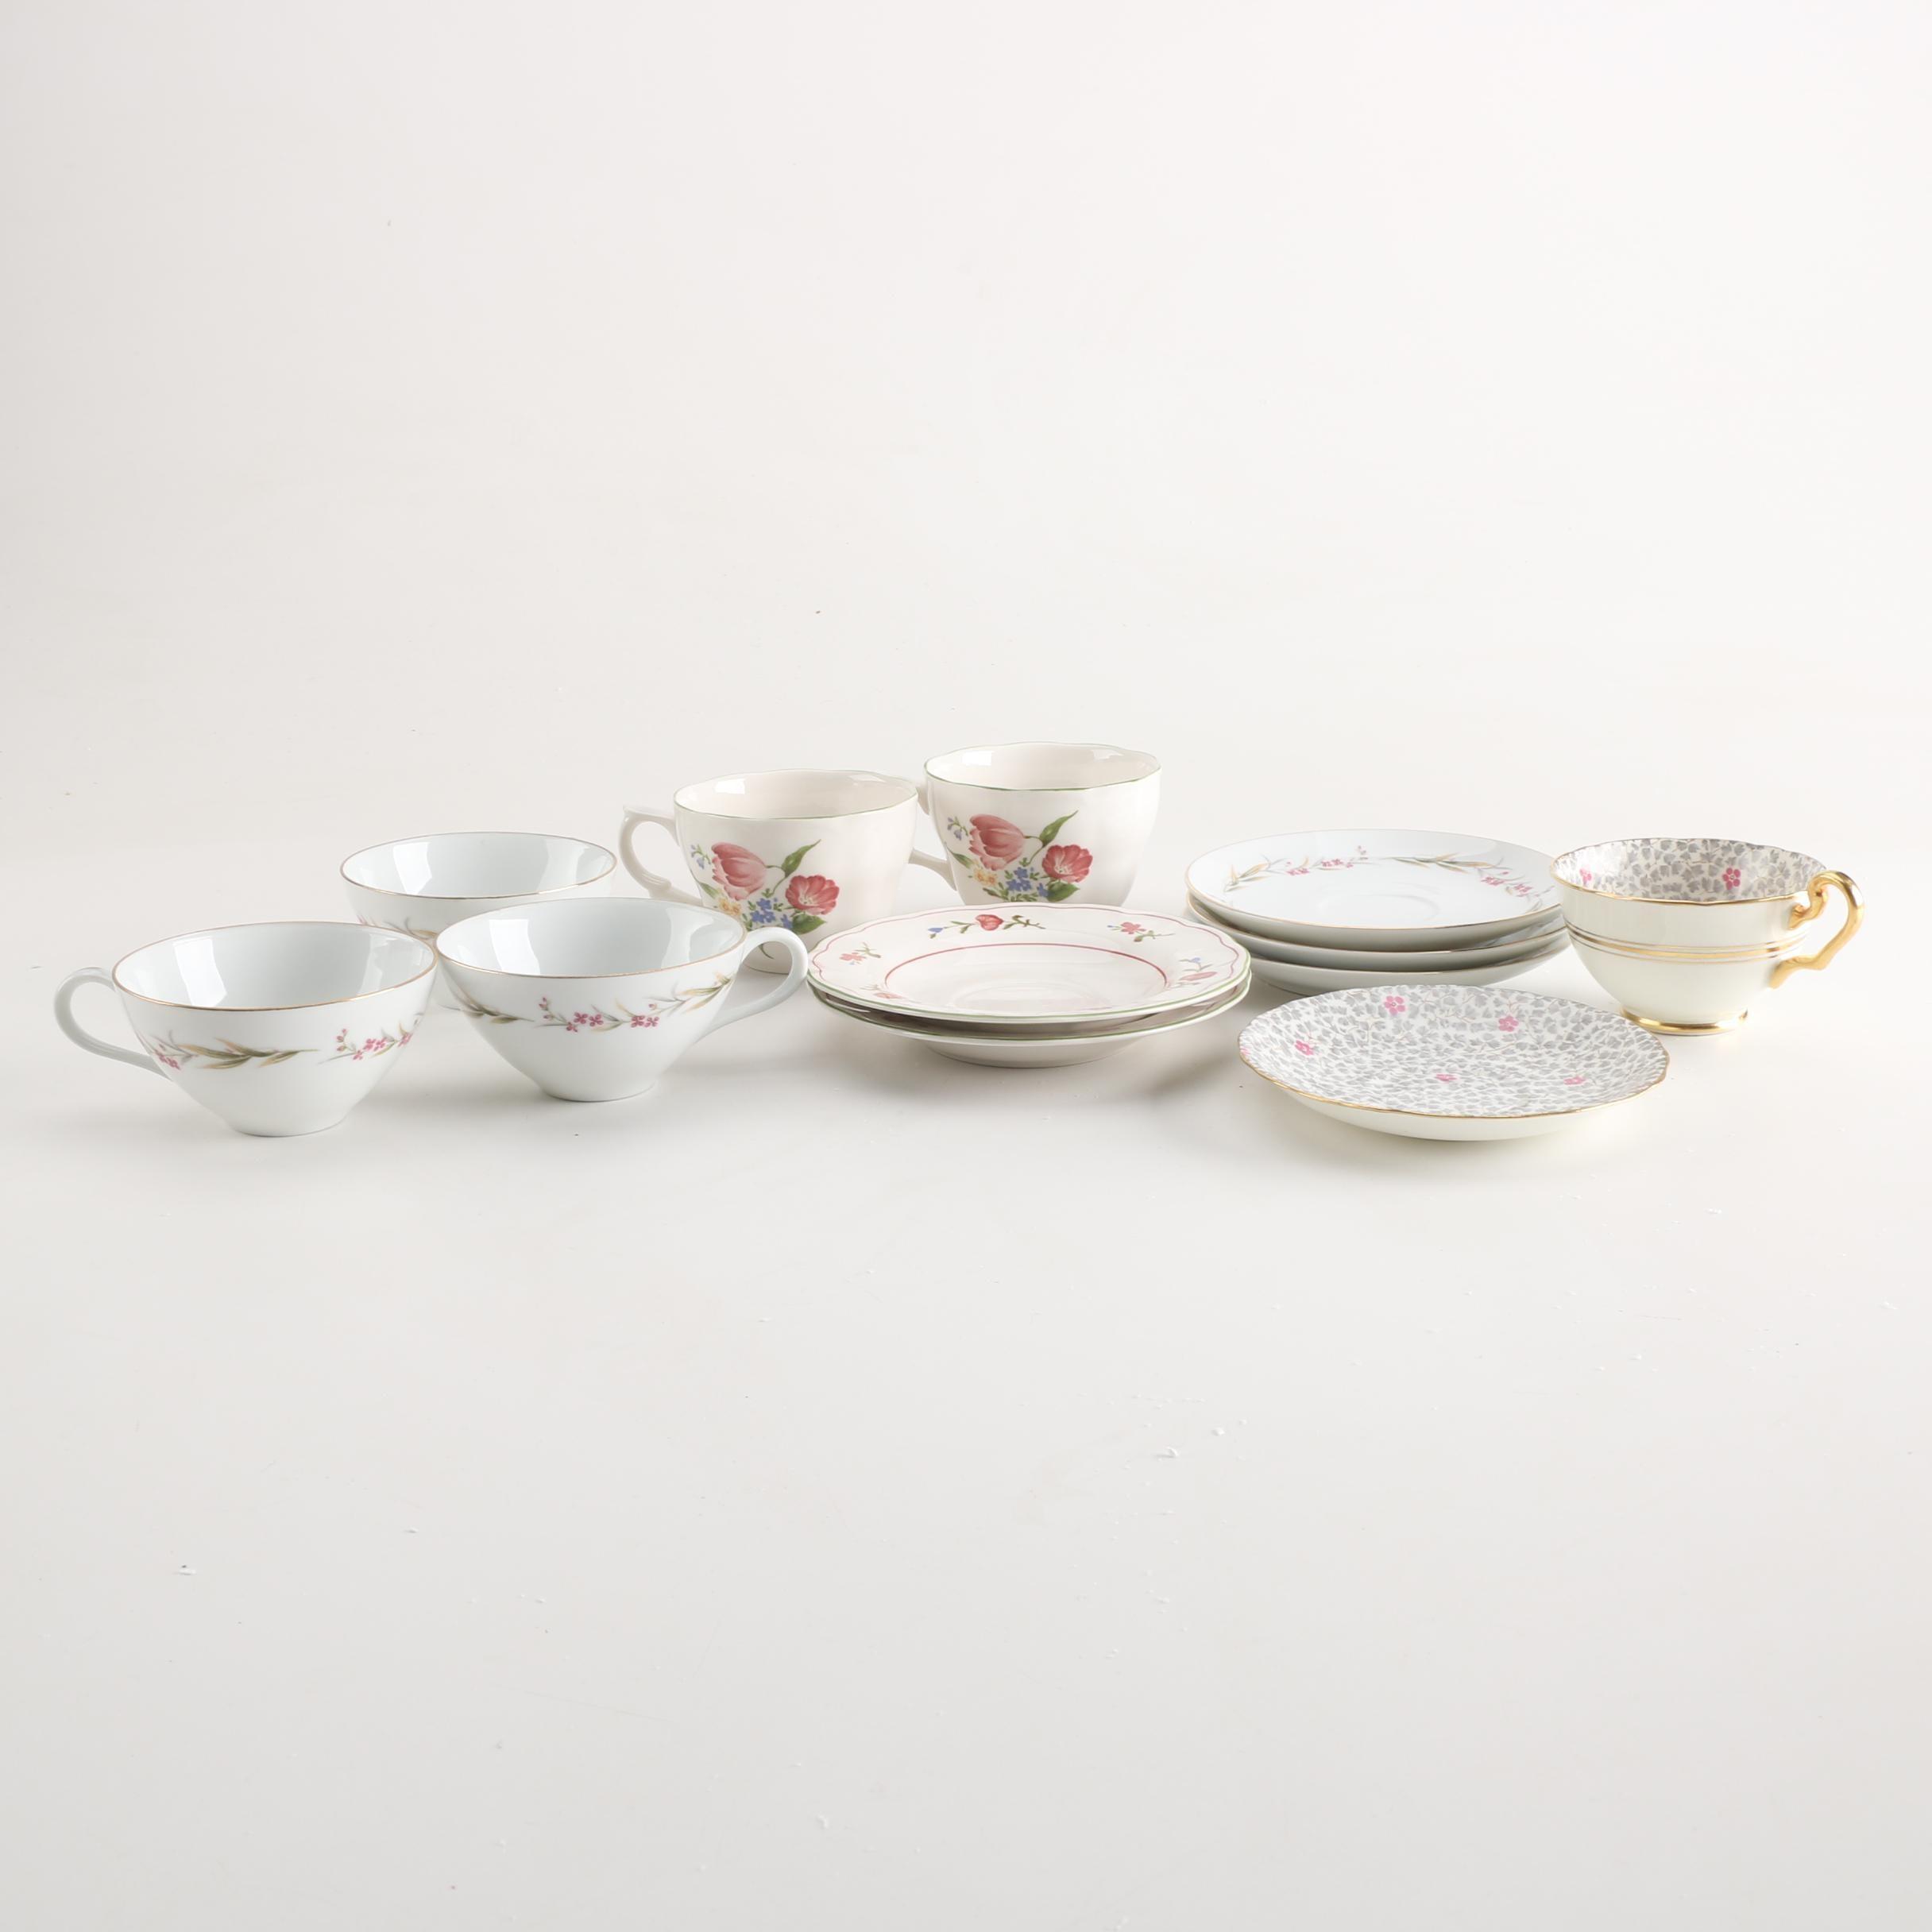 Vintage Porcelain Teacups and Saucers Including Victoria Bone China